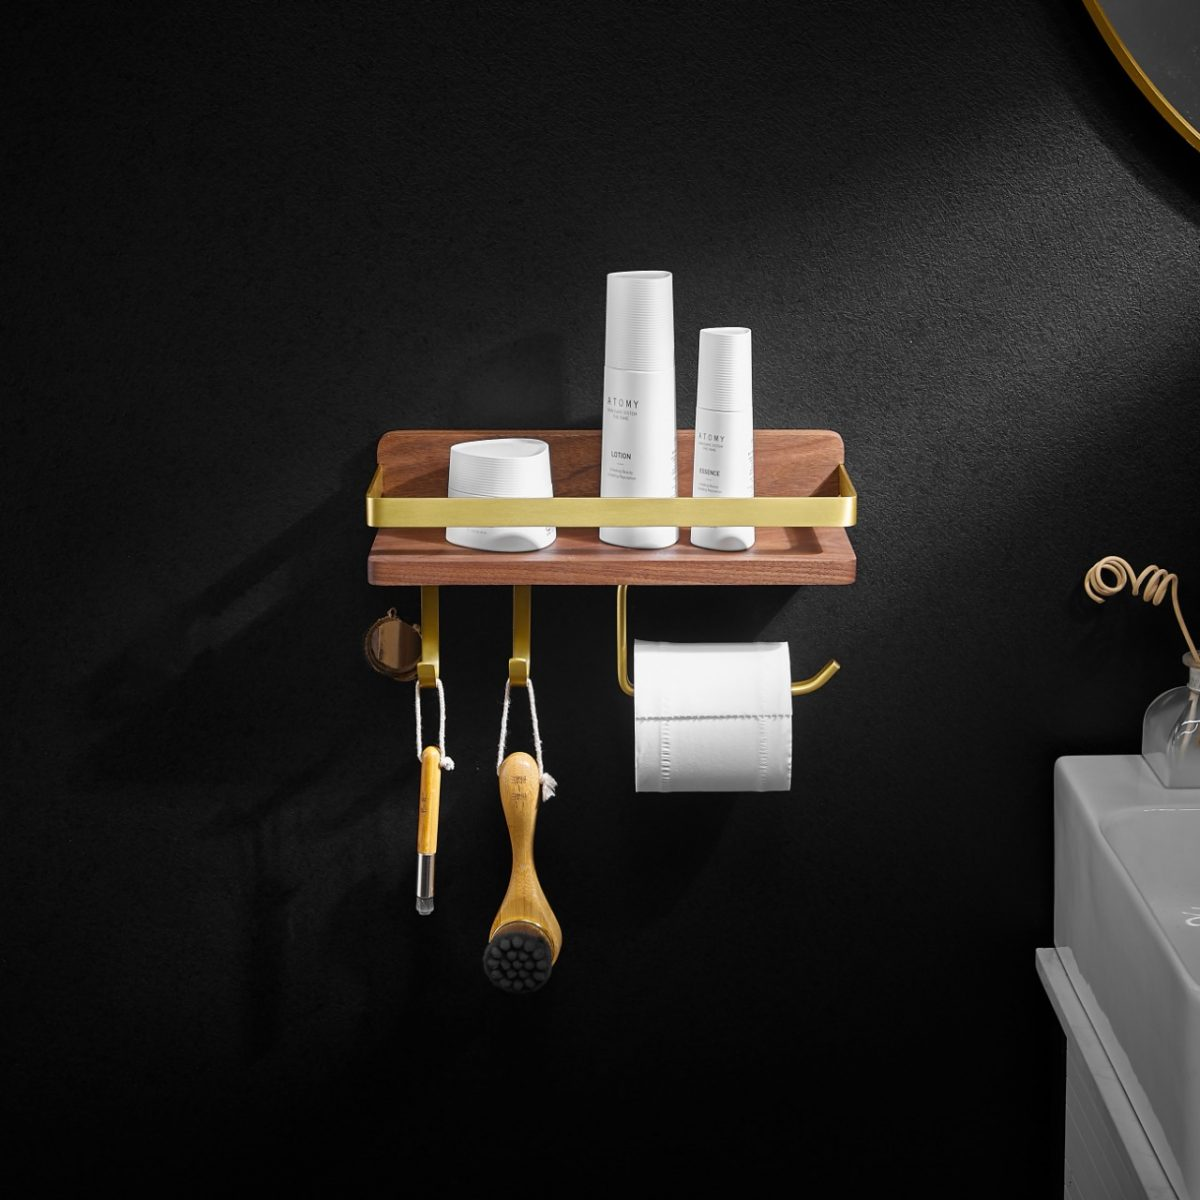 Walnut Wood with AL Cosmetic Shelf - 2/3 Hook